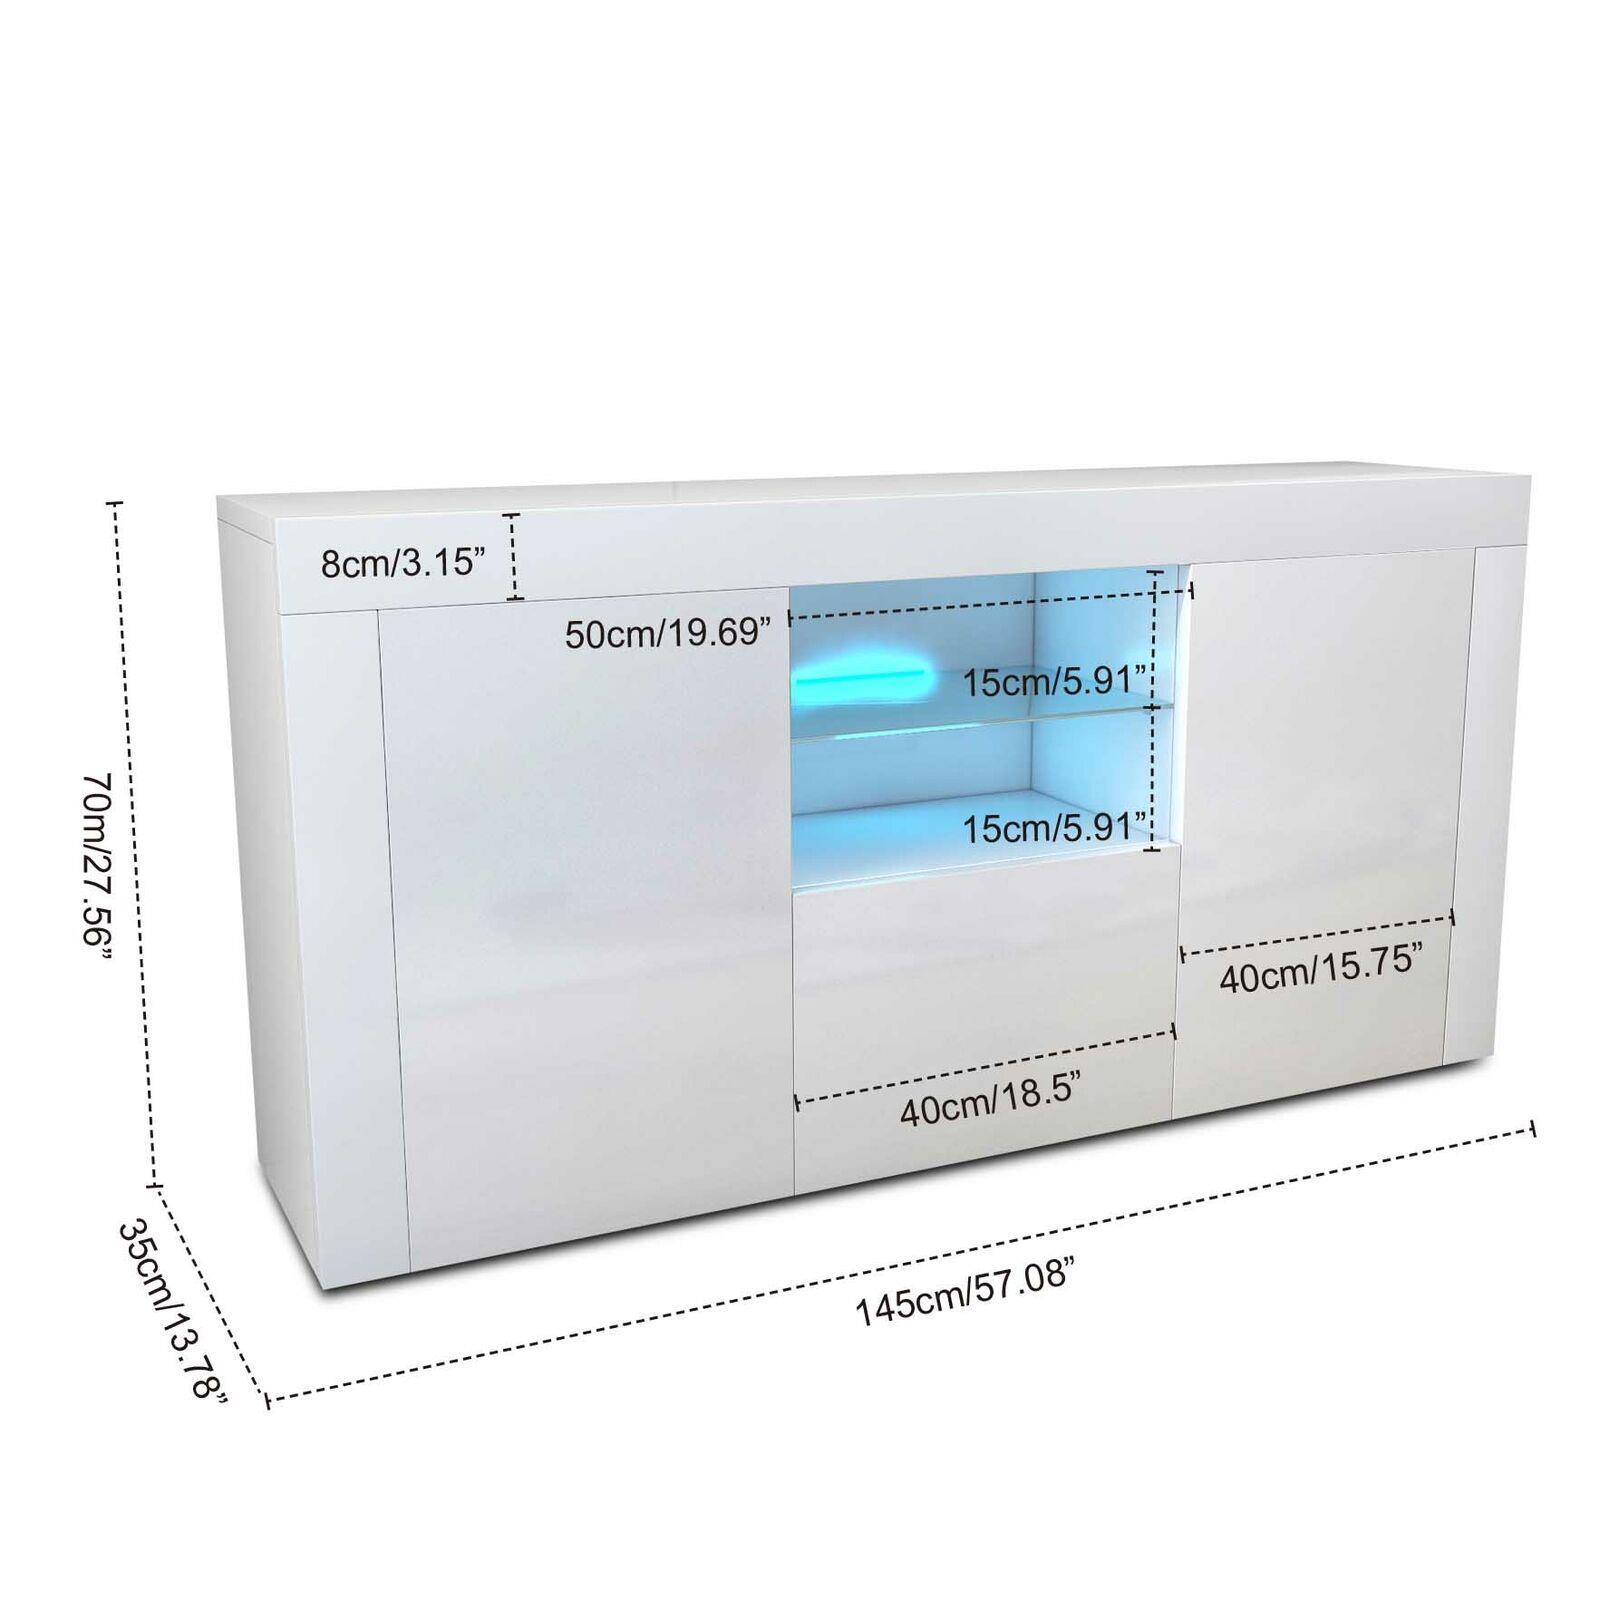 thumbnail 5 - Sideboard-3Doors-High-Gloss-Cabinet-Cupboard-Storage-TV-Unit-LED-Light